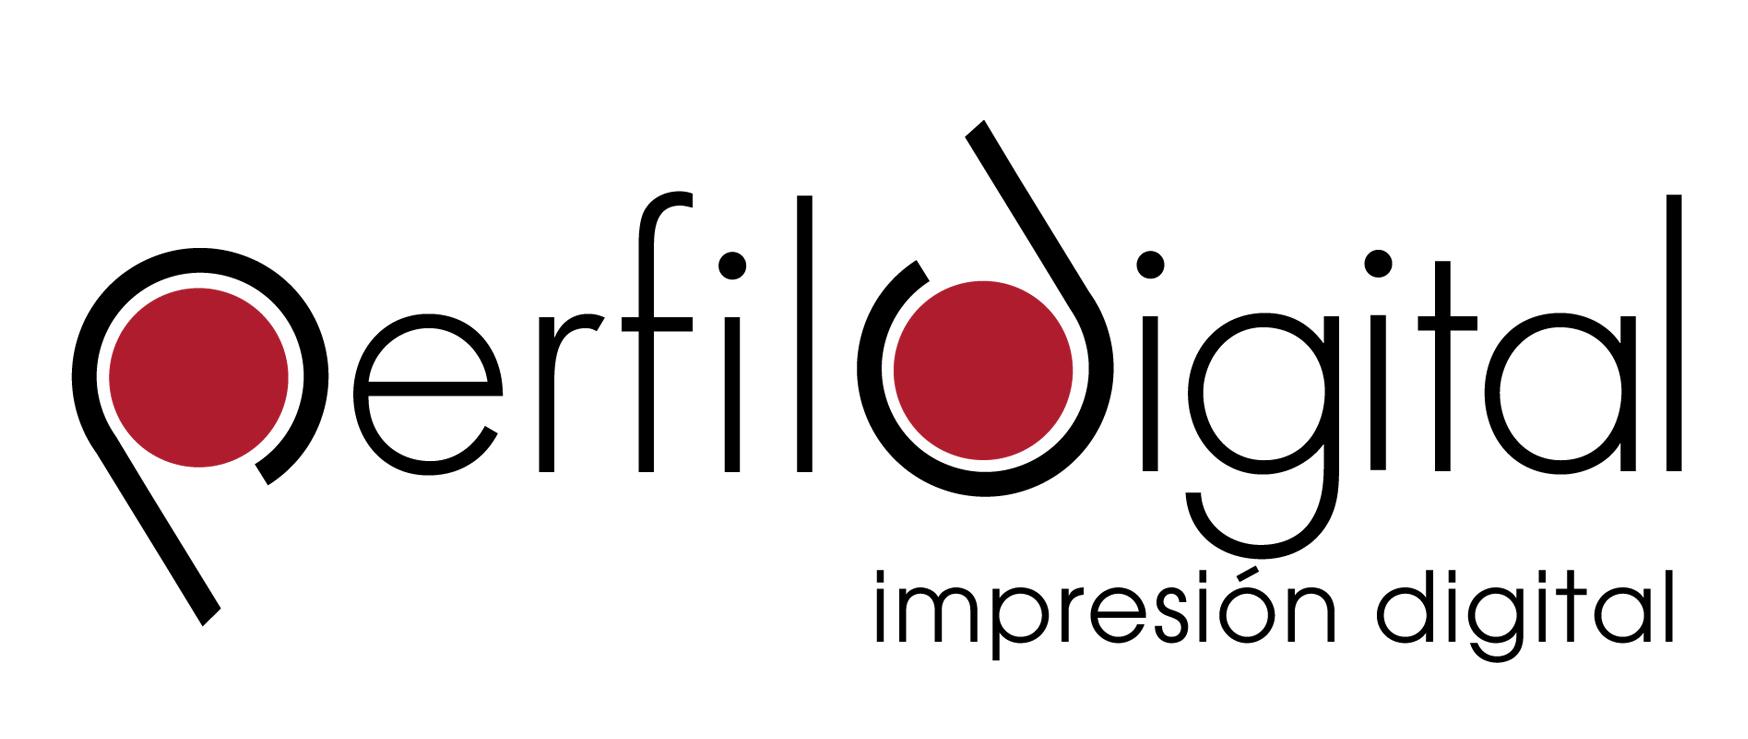 Perfil Digital impresiones